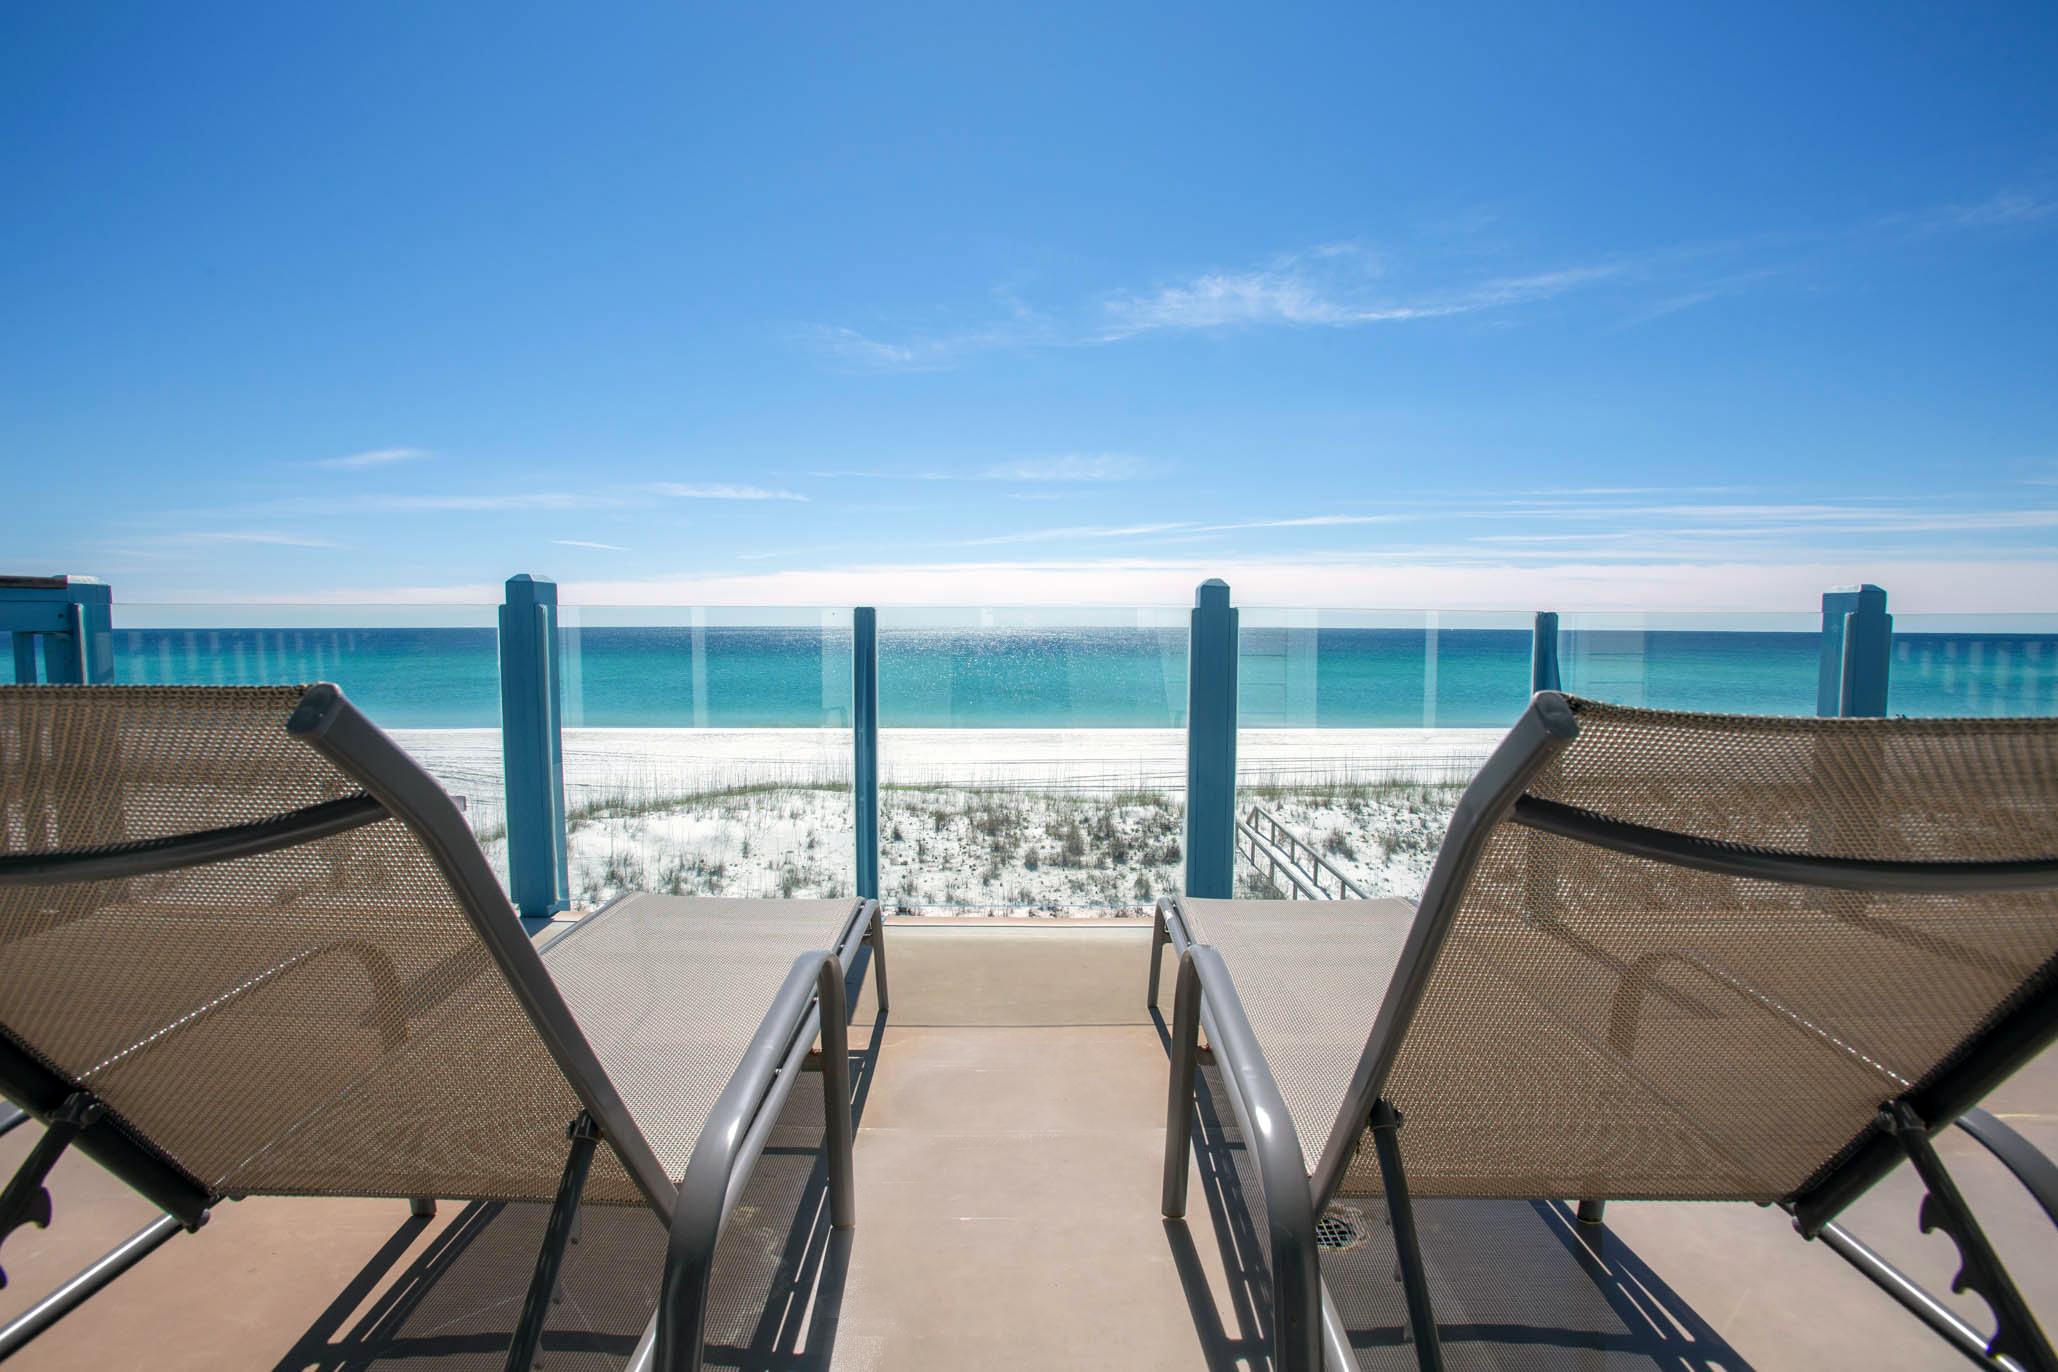 Ariola 1214 House/Cottage rental in Luxury Homes in Pensacola Beach Florida - #3